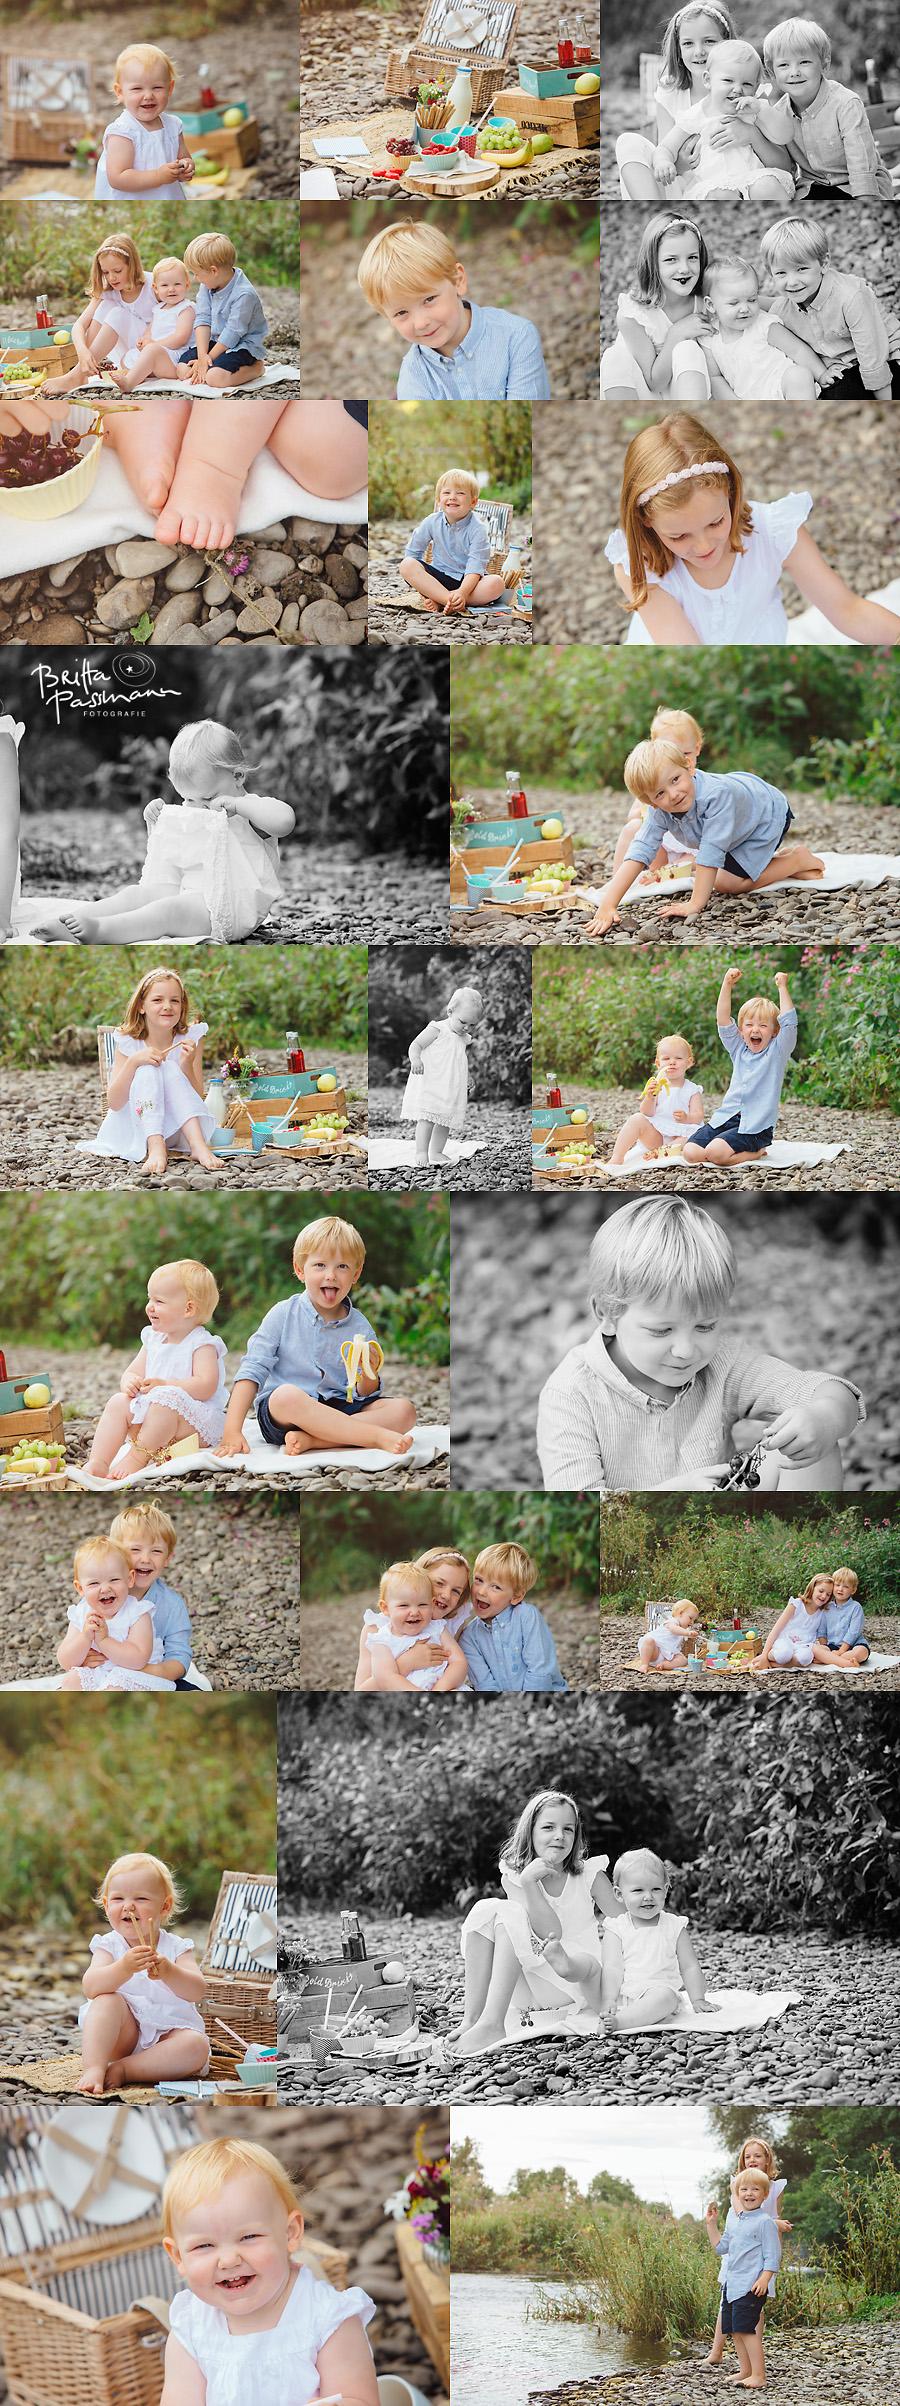 Familienpicknick_Fotoshooting_Familienfotos_Kinderfotos_Dortmund_Schwerte_02